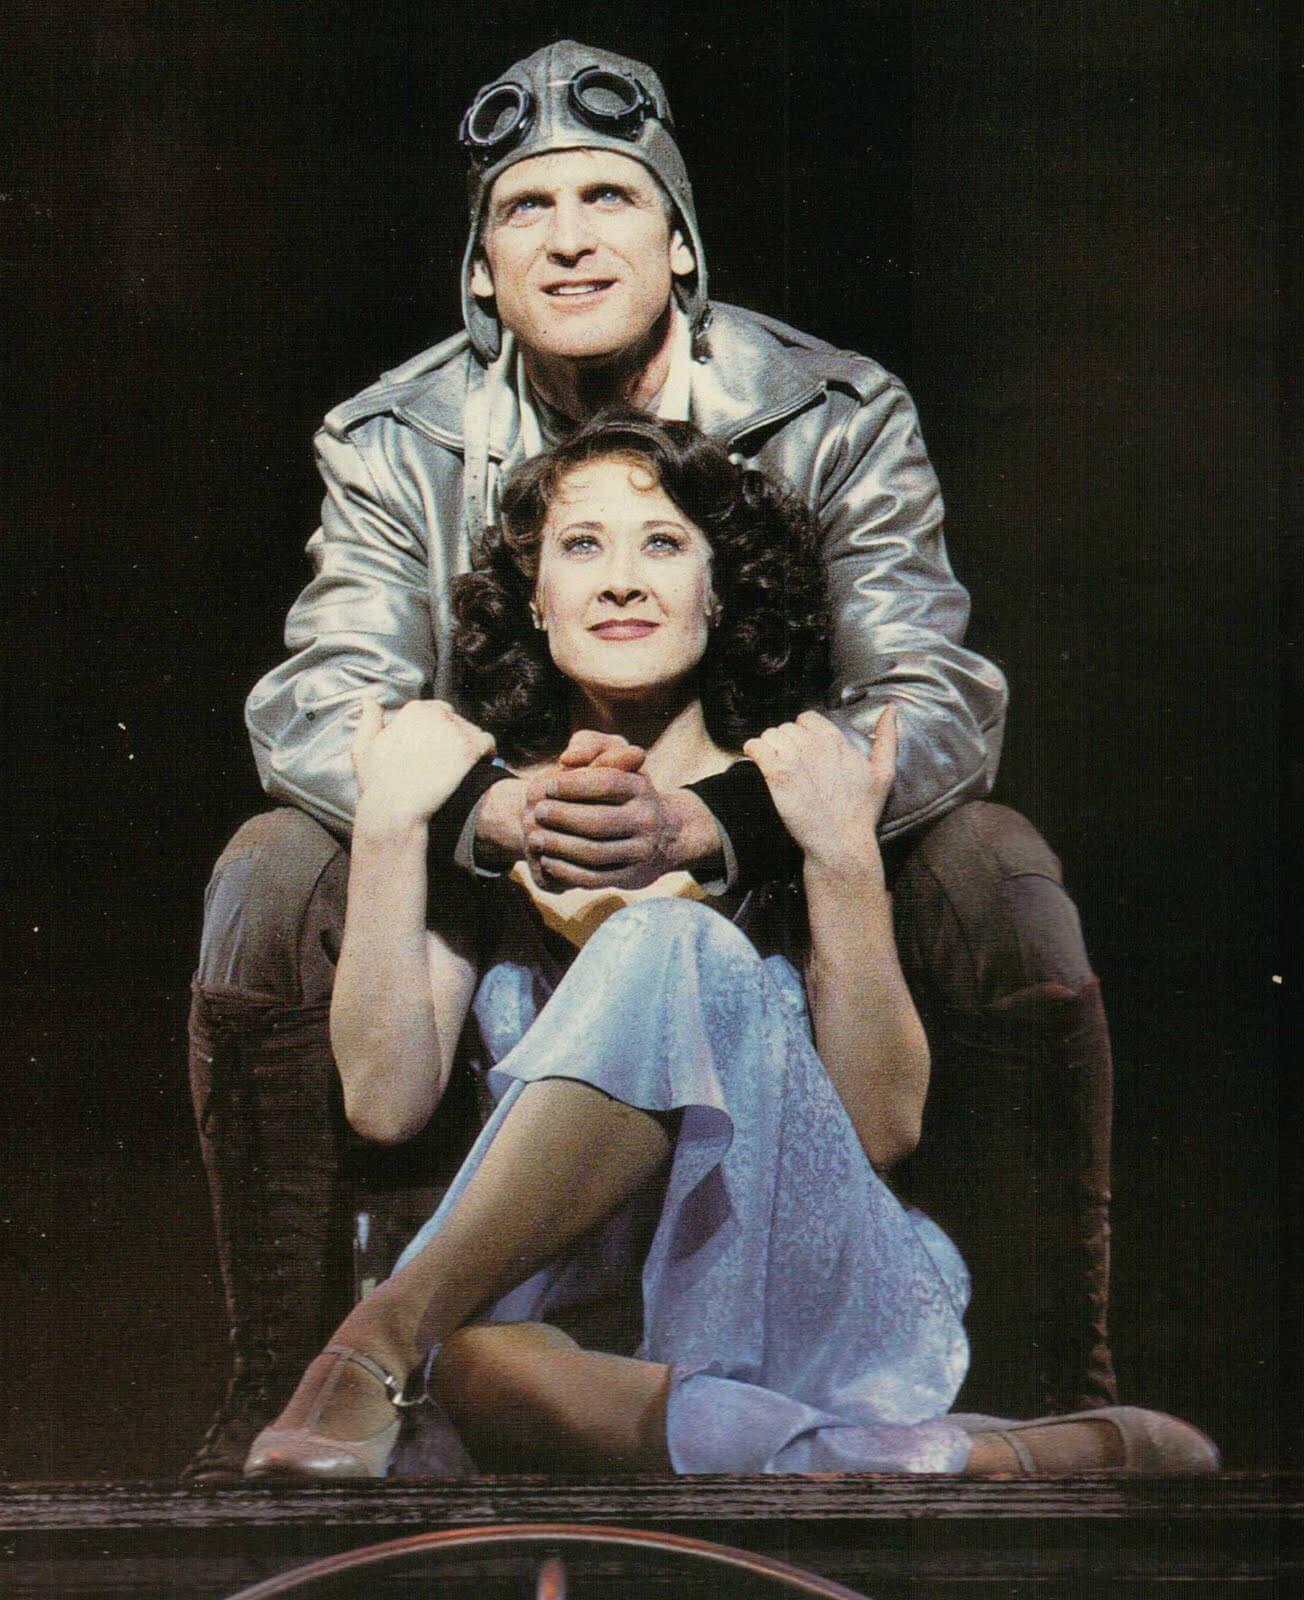 "Bill Kelly (Daniel McDonald) in a pilot suit, embracing Rita Racine (Karen Ziemba) from behind. Rita holding his arms singing ""First You Dream""."